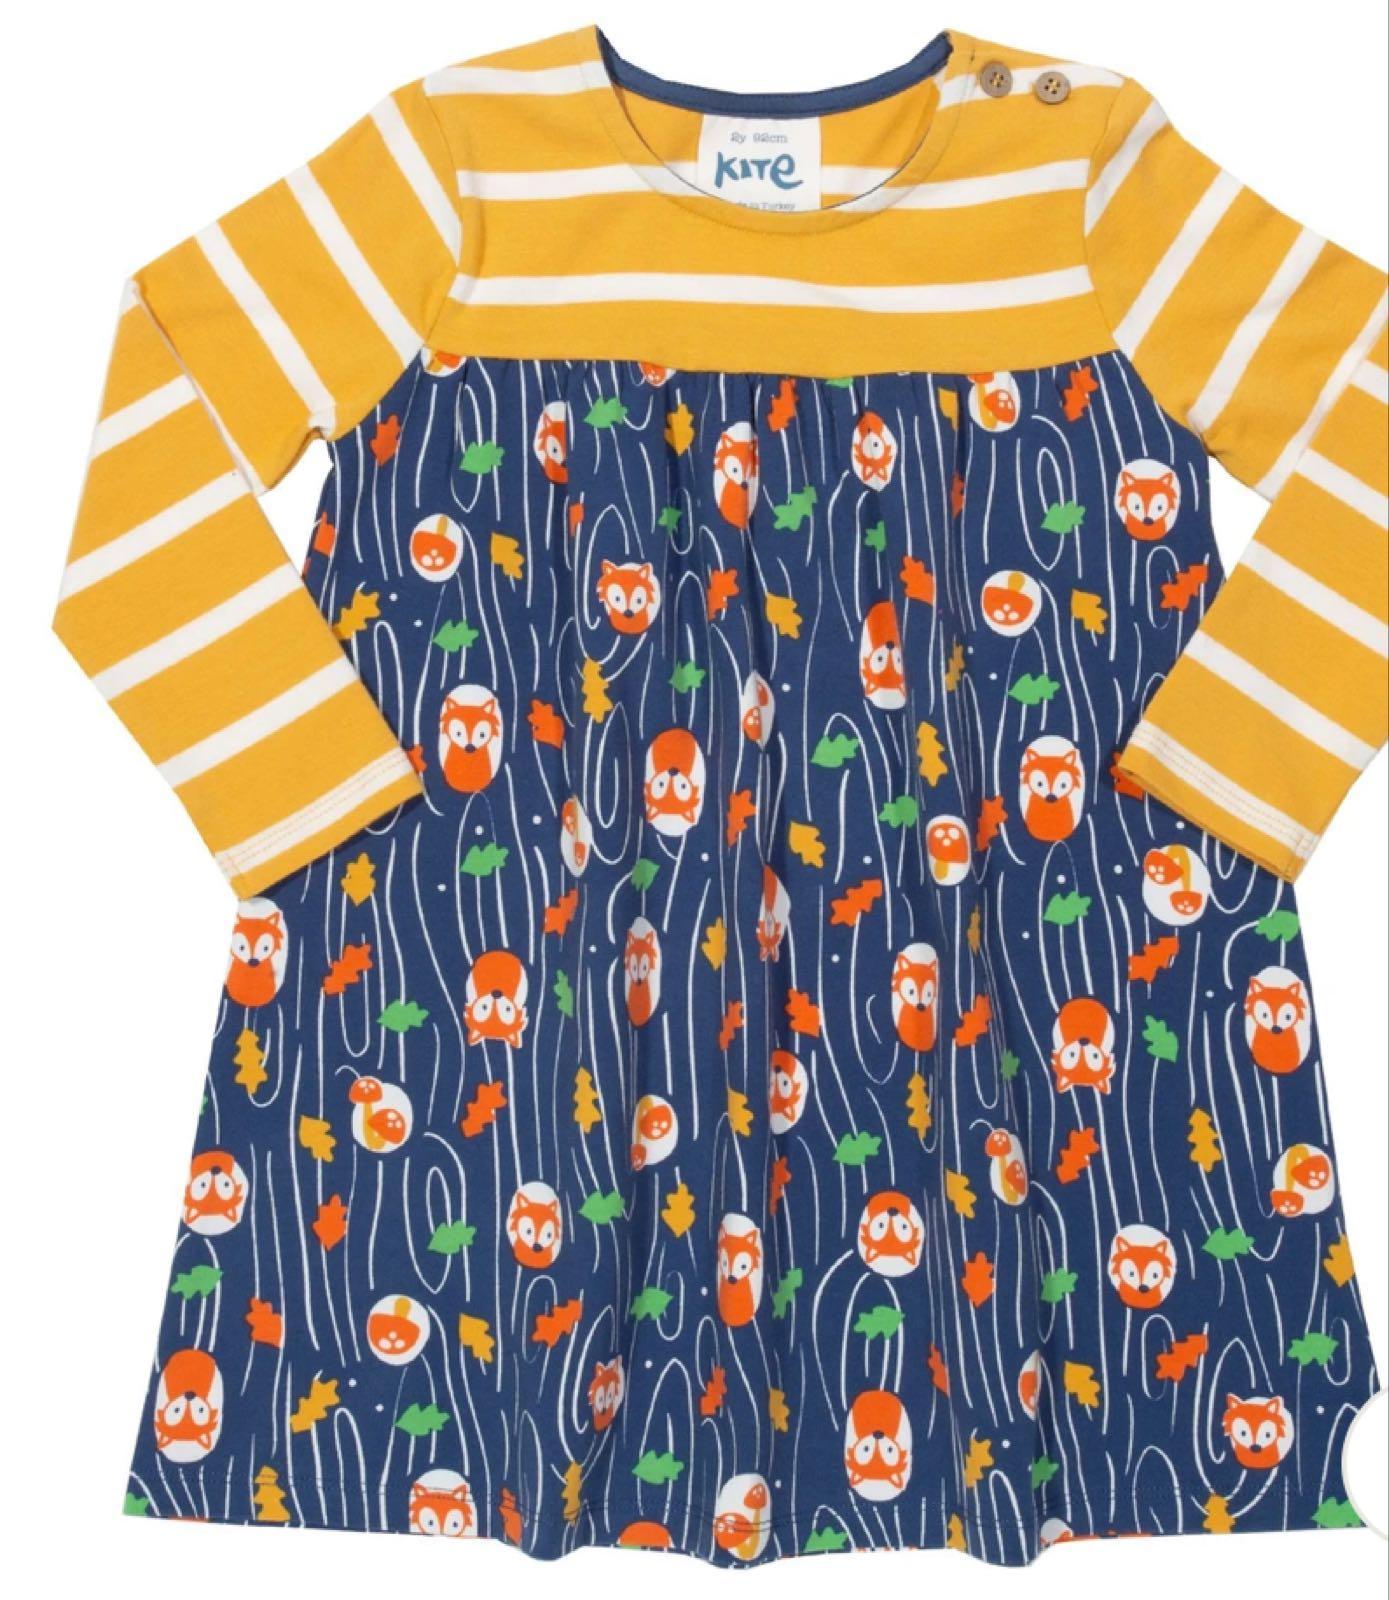 Treehouse dress